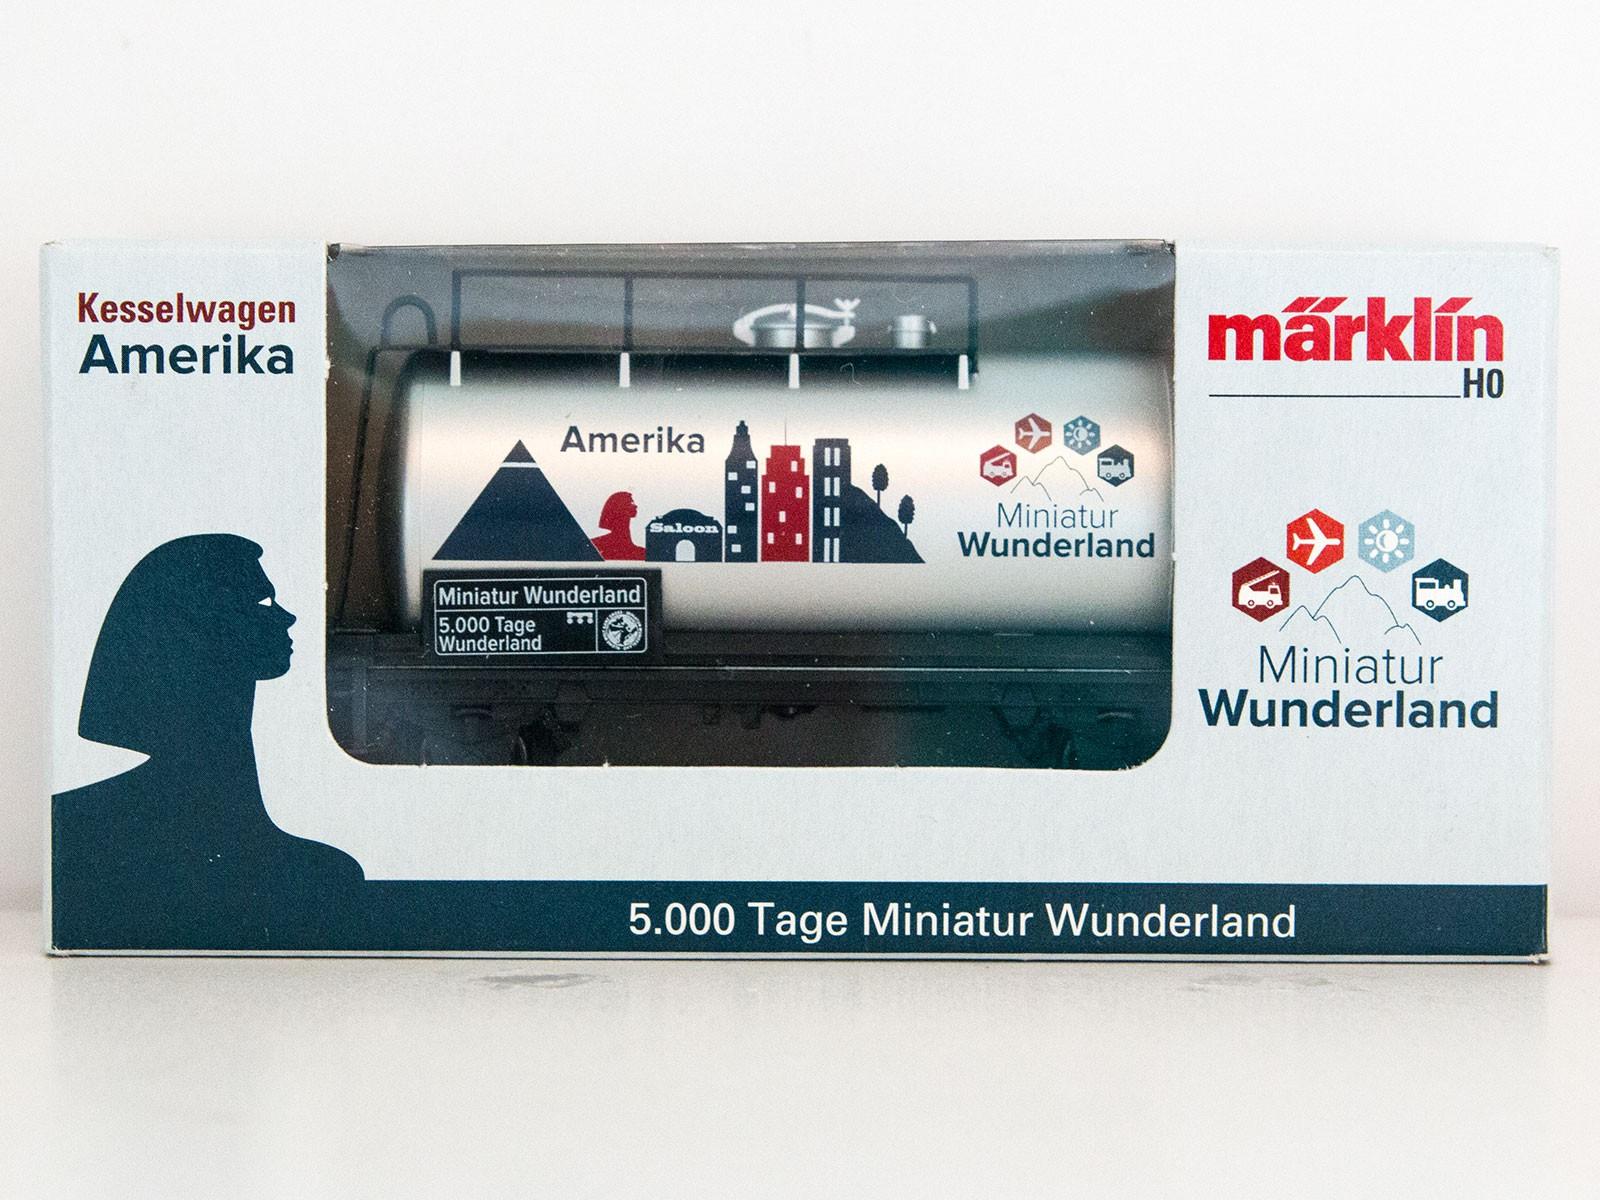 "Limitierter Sonderwagen H0 Märklin 2015 Kesselwagen ""5000 Tage Wunderland - Amerika"""